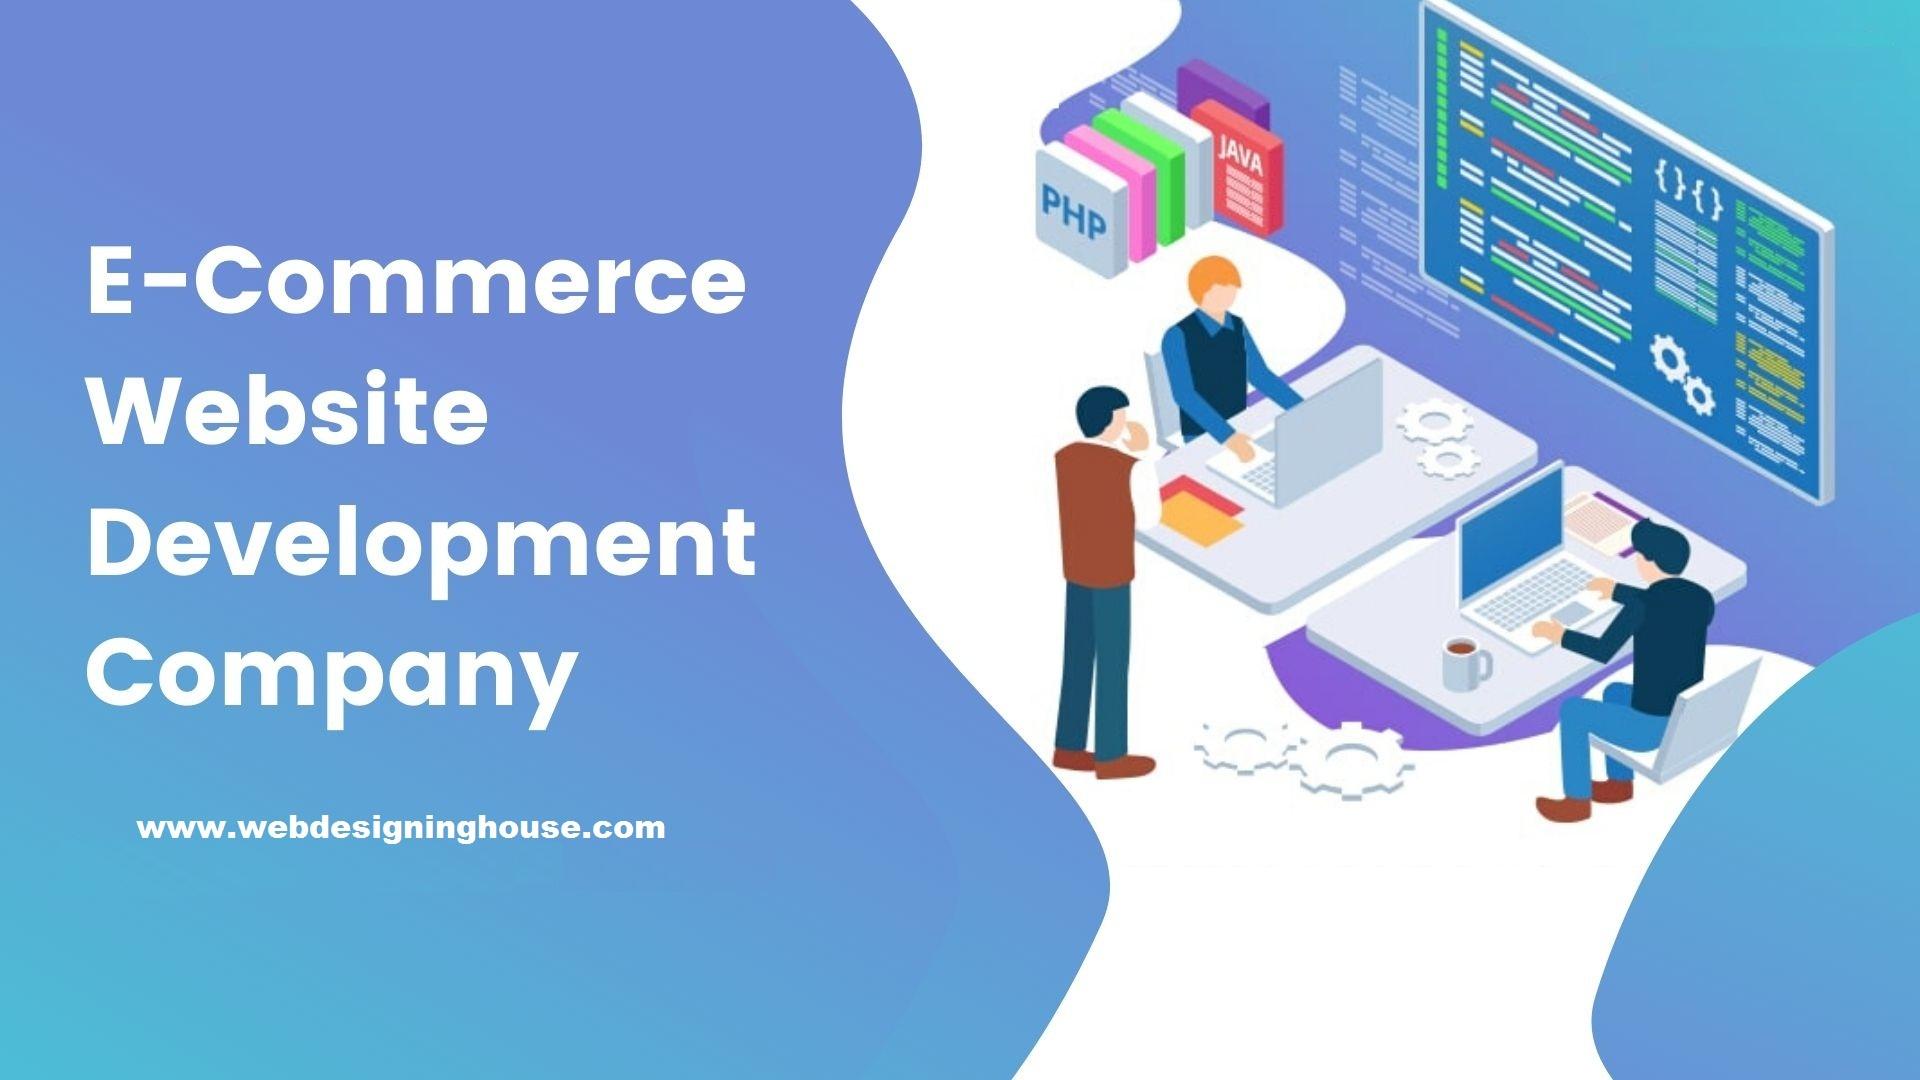 eCommerce Website Development Company-7aa64531